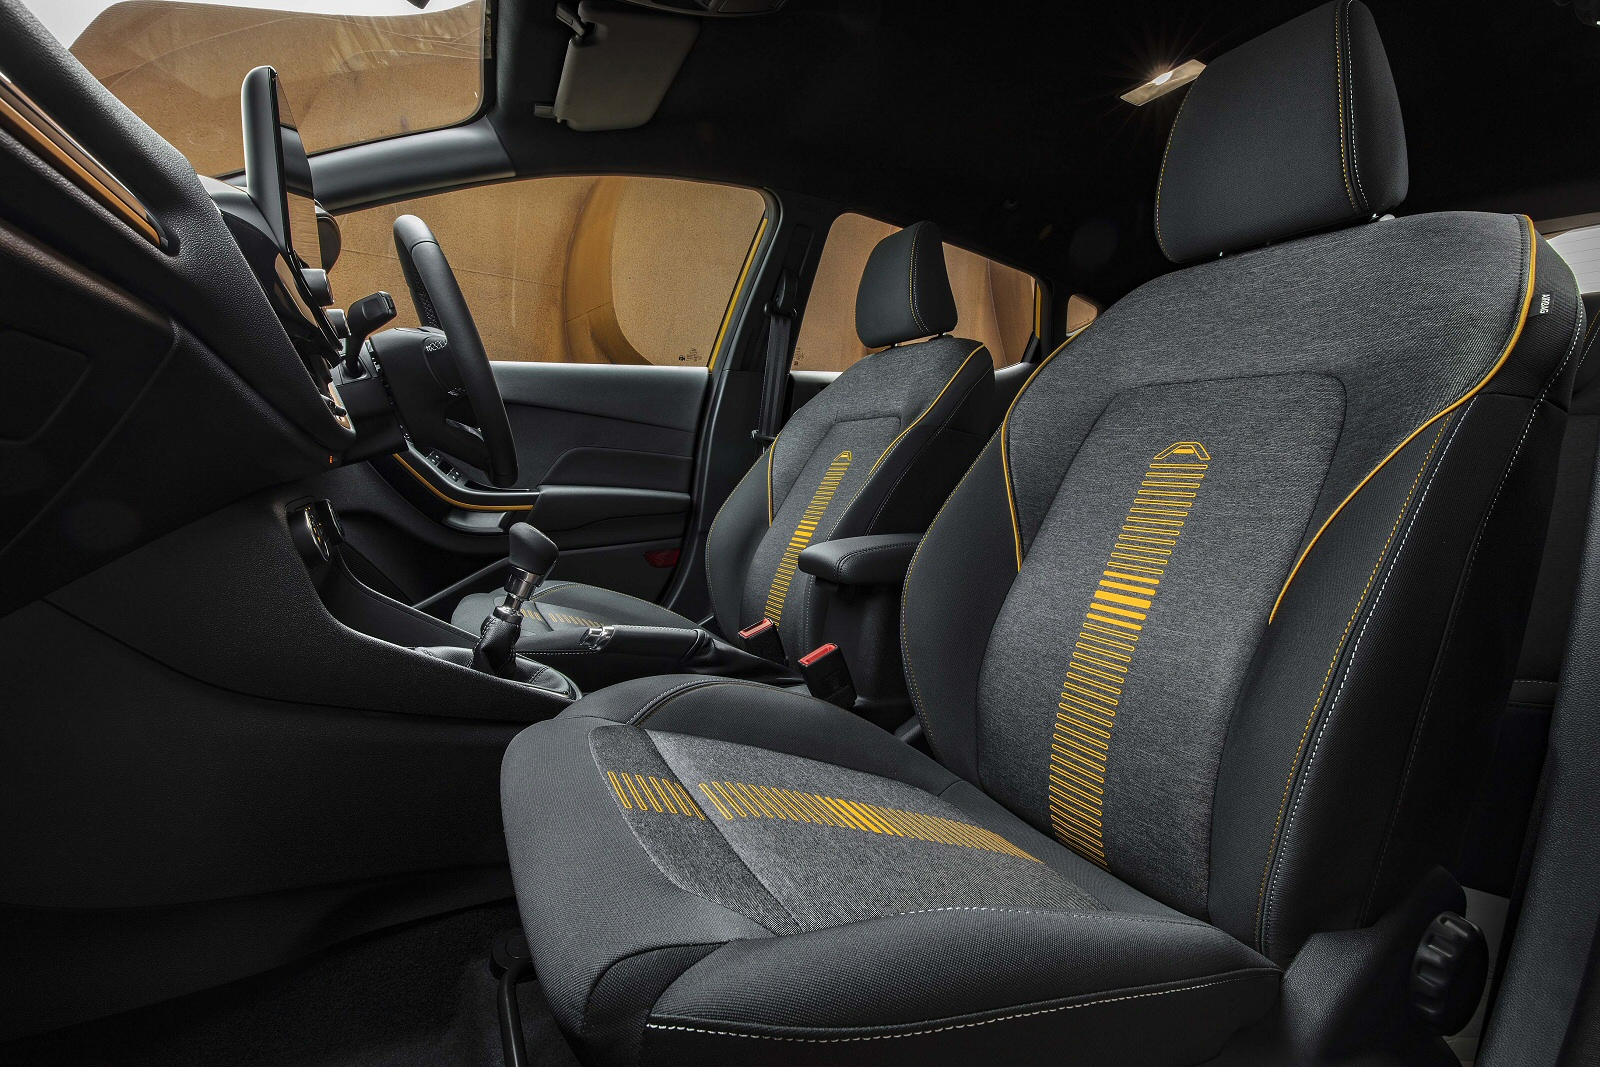 new ford fiesta 1 0 ecoboost active 1 navigation 5dr auto. Black Bedroom Furniture Sets. Home Design Ideas